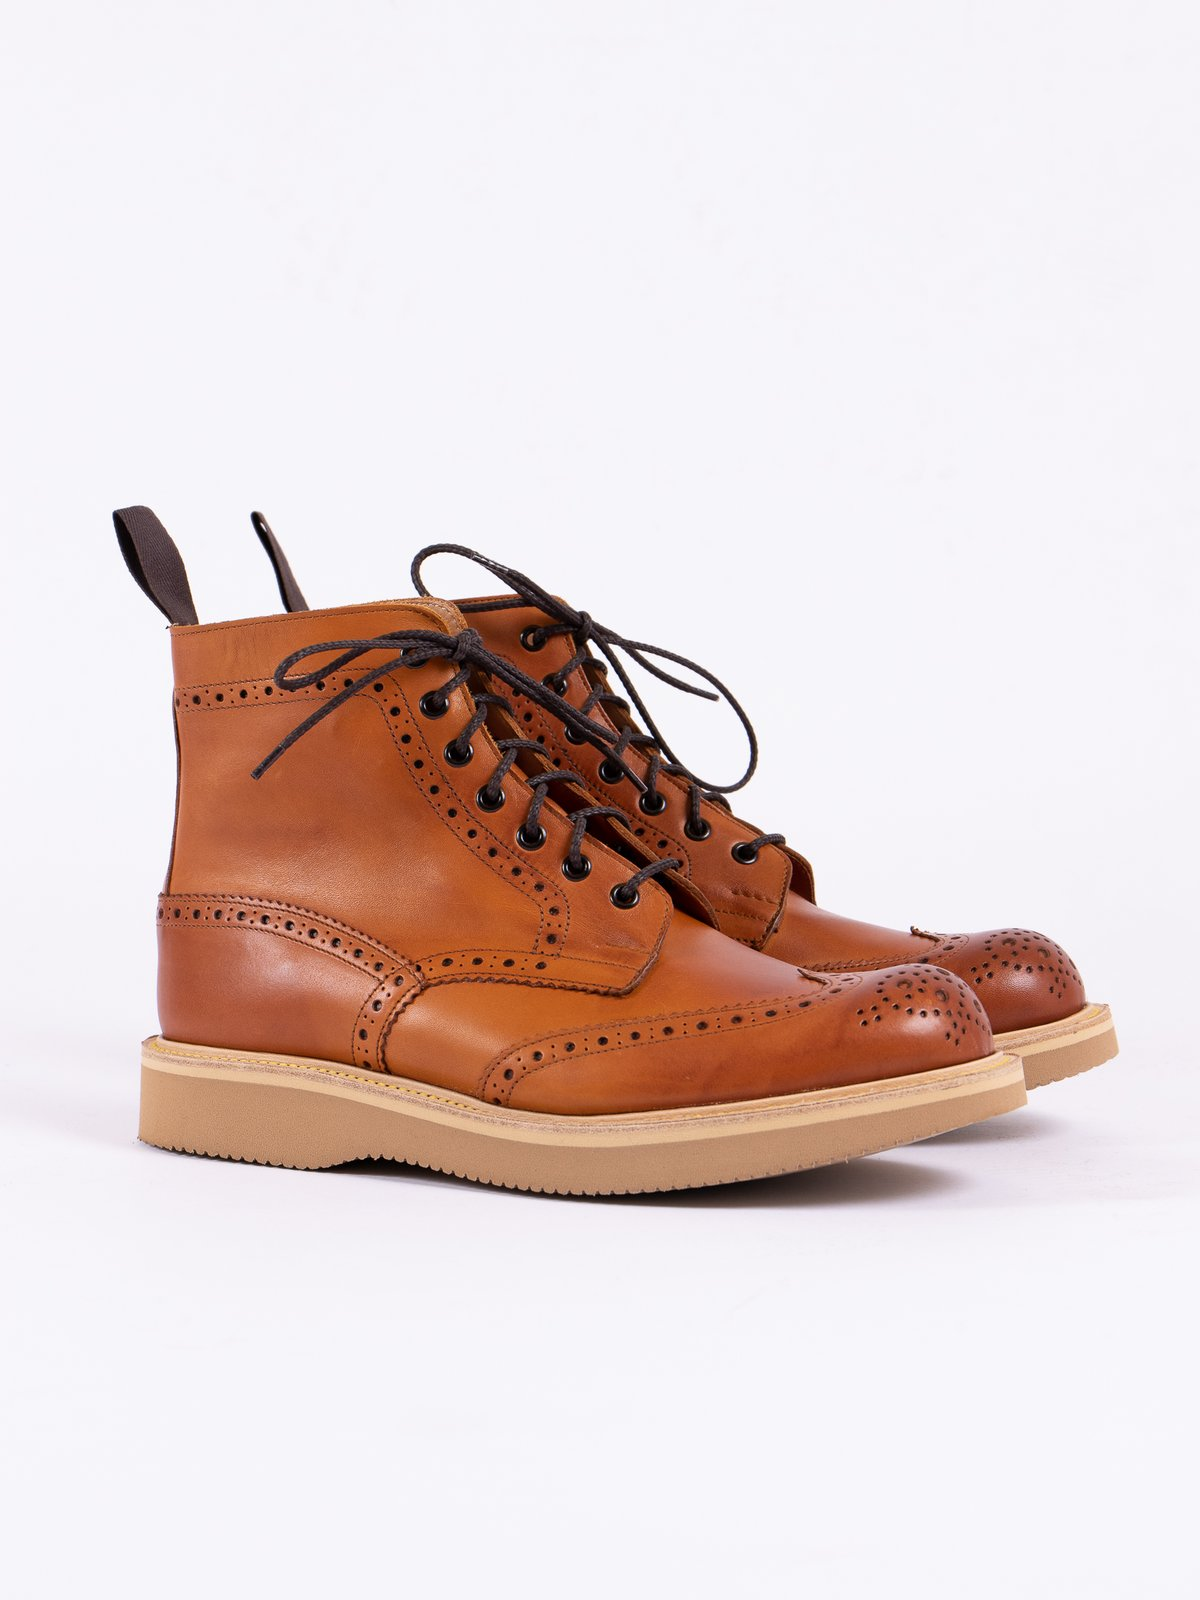 Acorn Funchal Brogue Stow Boot - Image 1